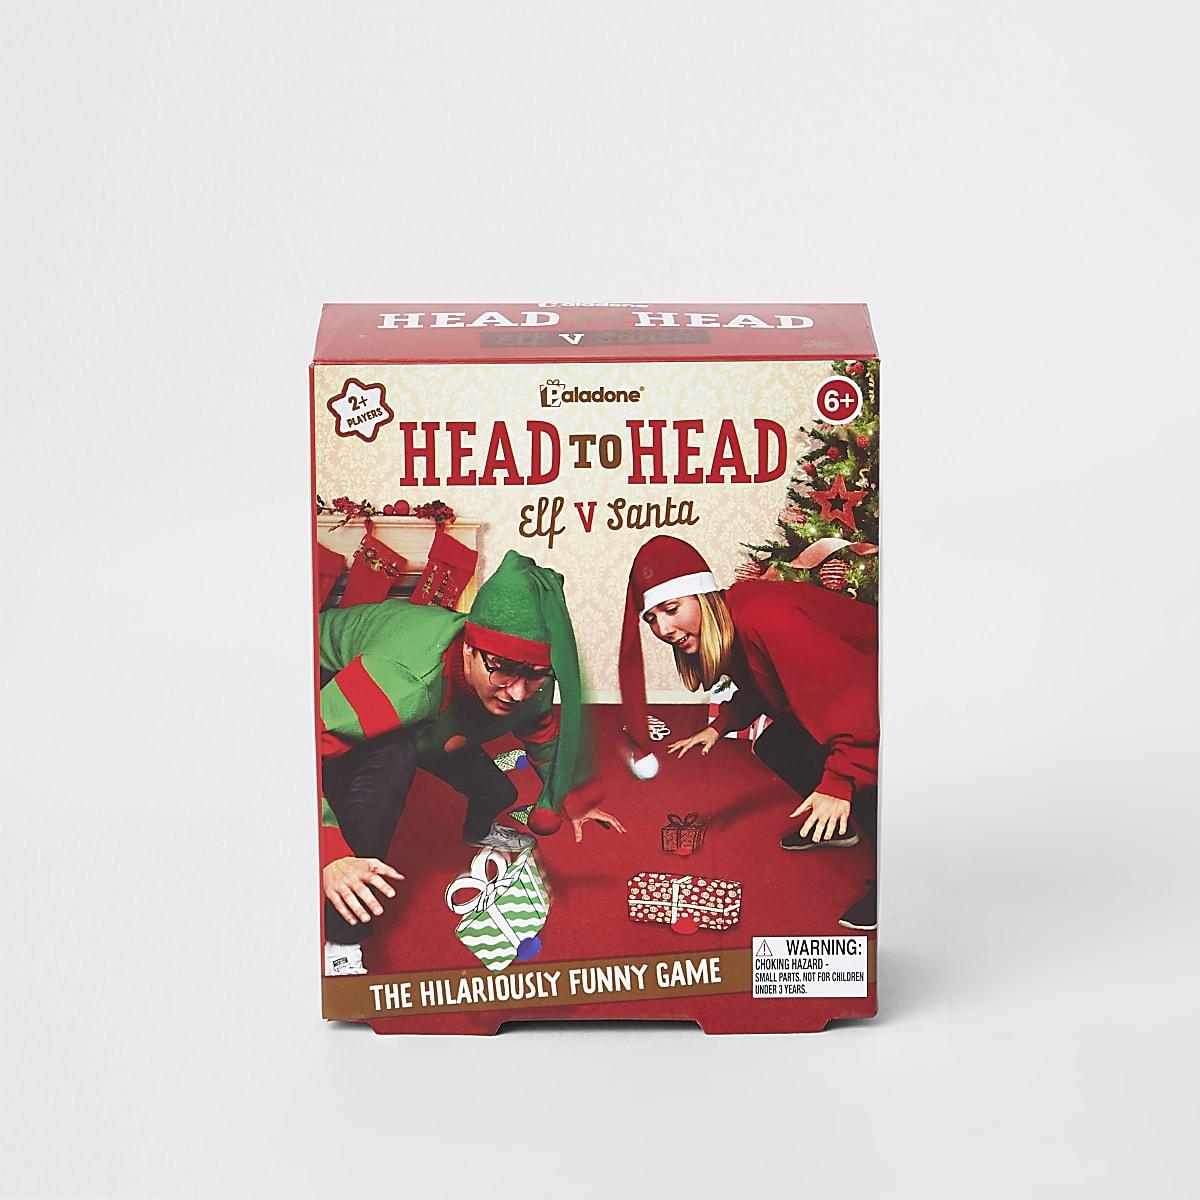 Red Head to Head Elf Vs Santa game